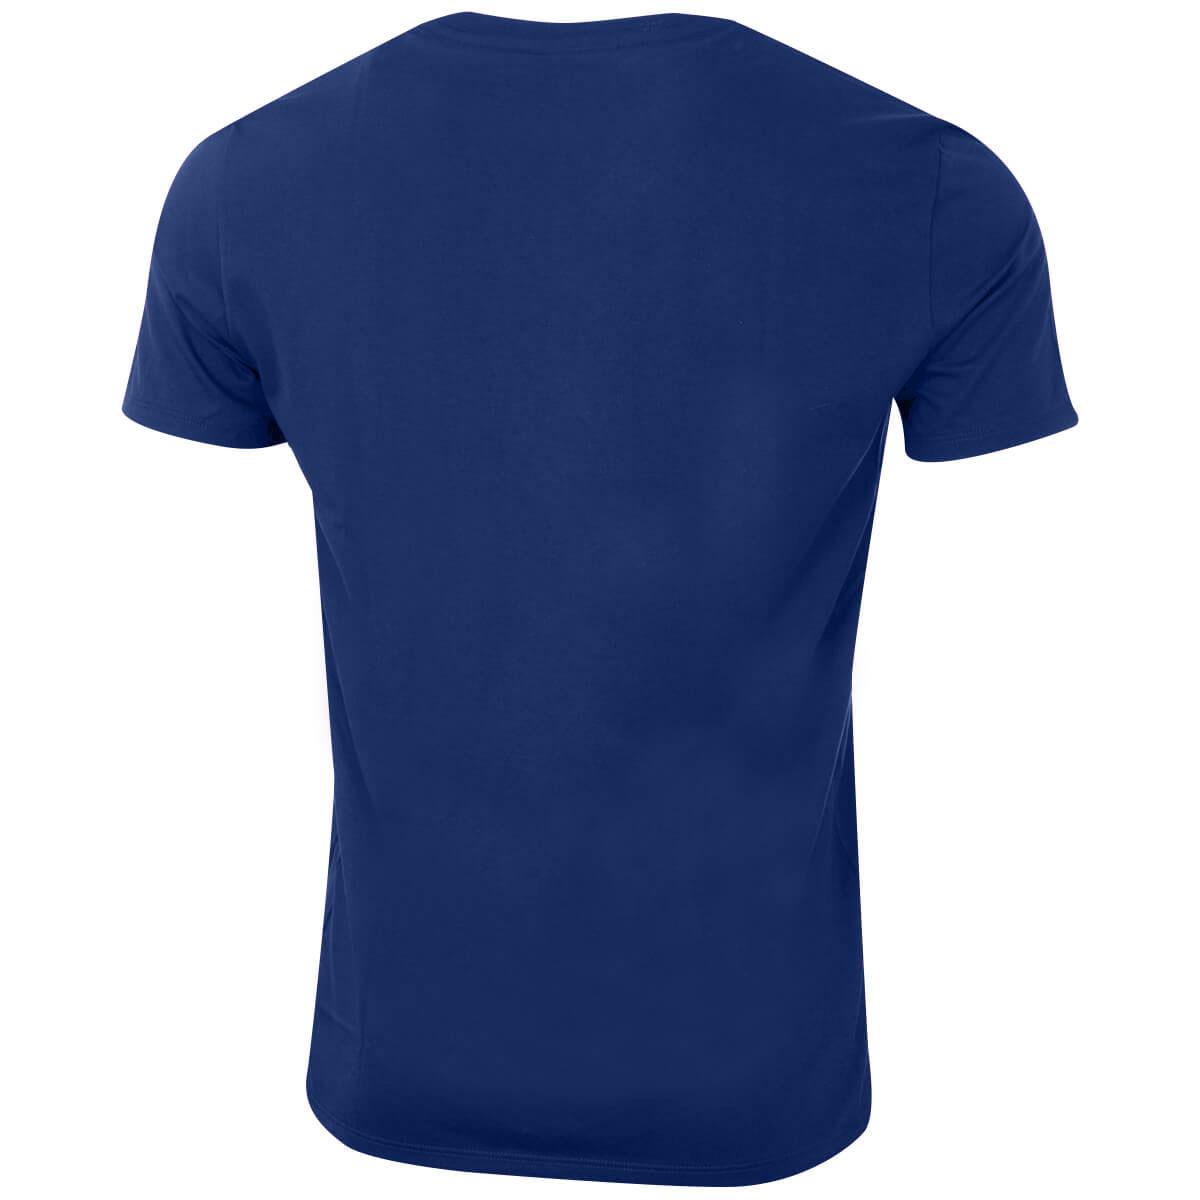 Lacoste-Mens-2019-SS-V-Neck-TH6710-Short-Sleeve-Pima-Cotton-Tee-T-Shirt thumbnail 8